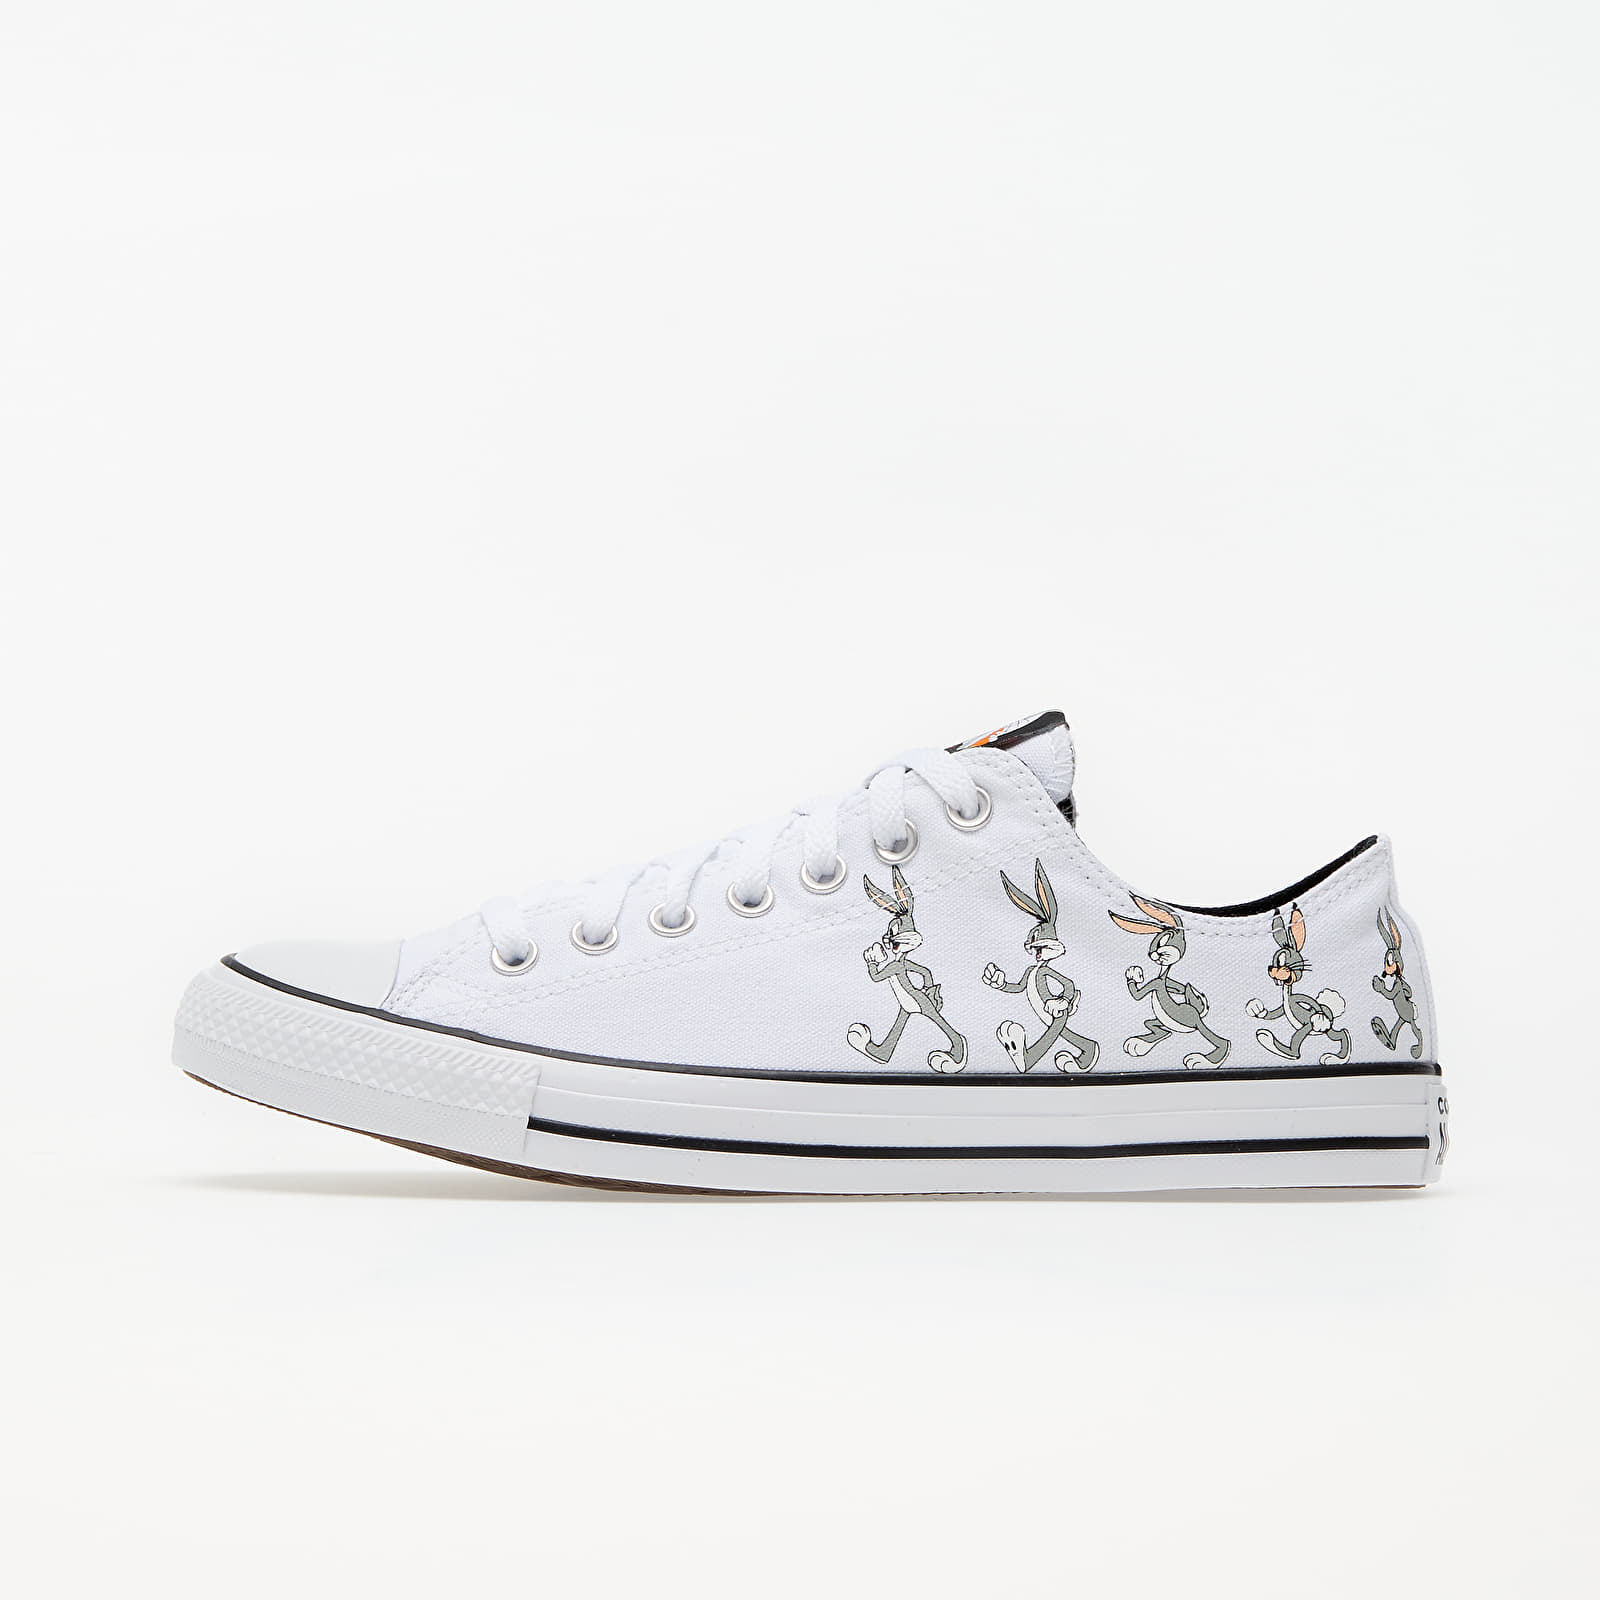 Converse x Bugs Bunny Chuck Taylor All Star OX Grey/ White EUR 42